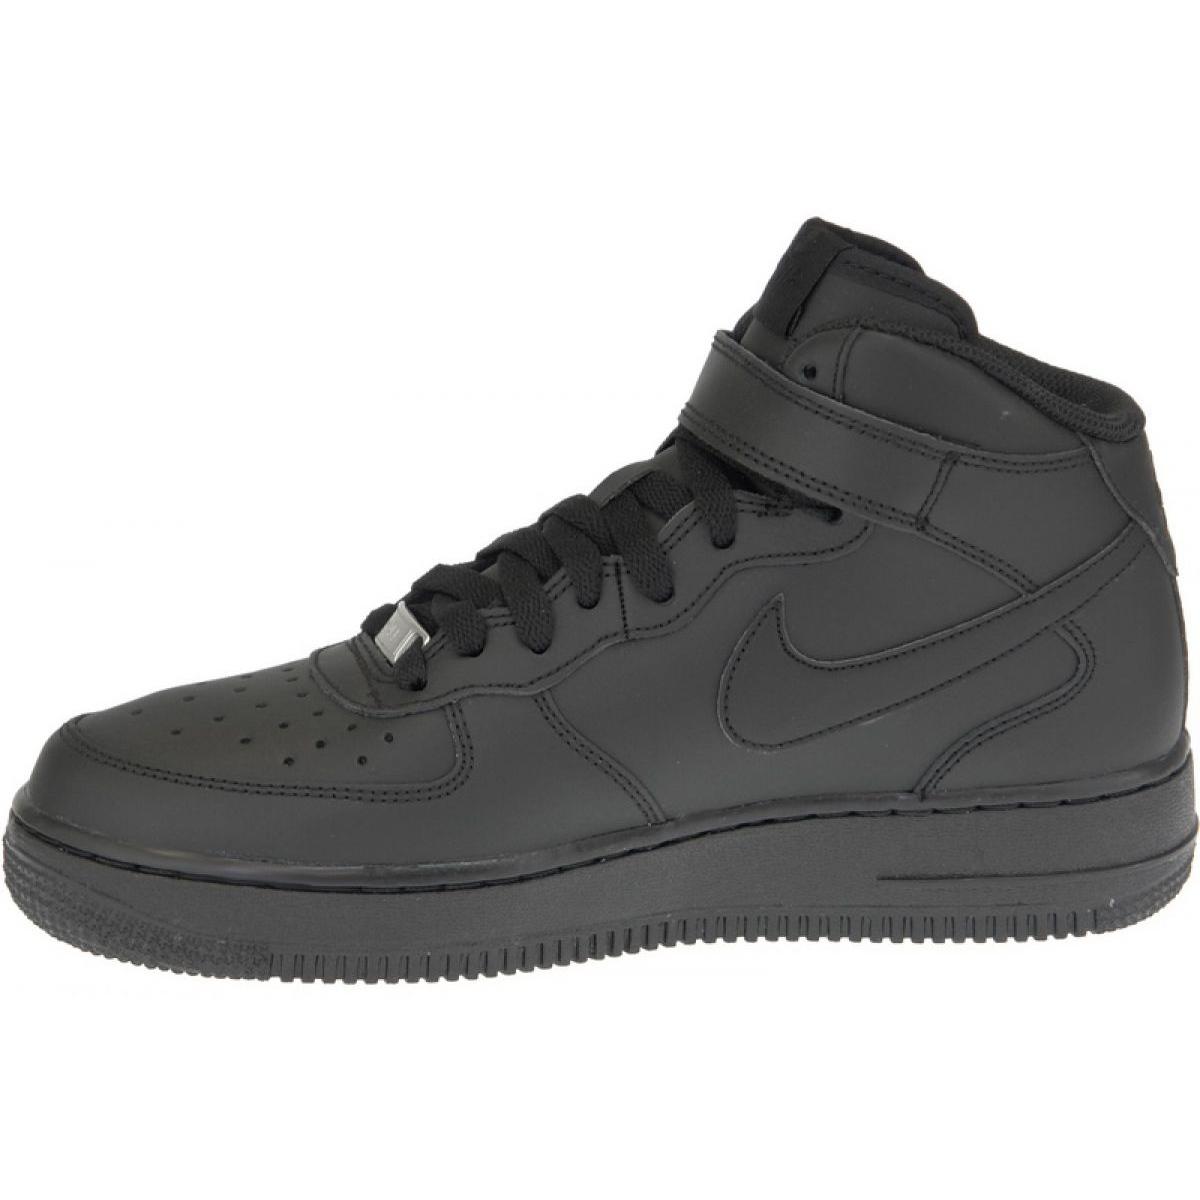 Cipő Nike Air Force 1 Mid Gs W 314195 004 fekete